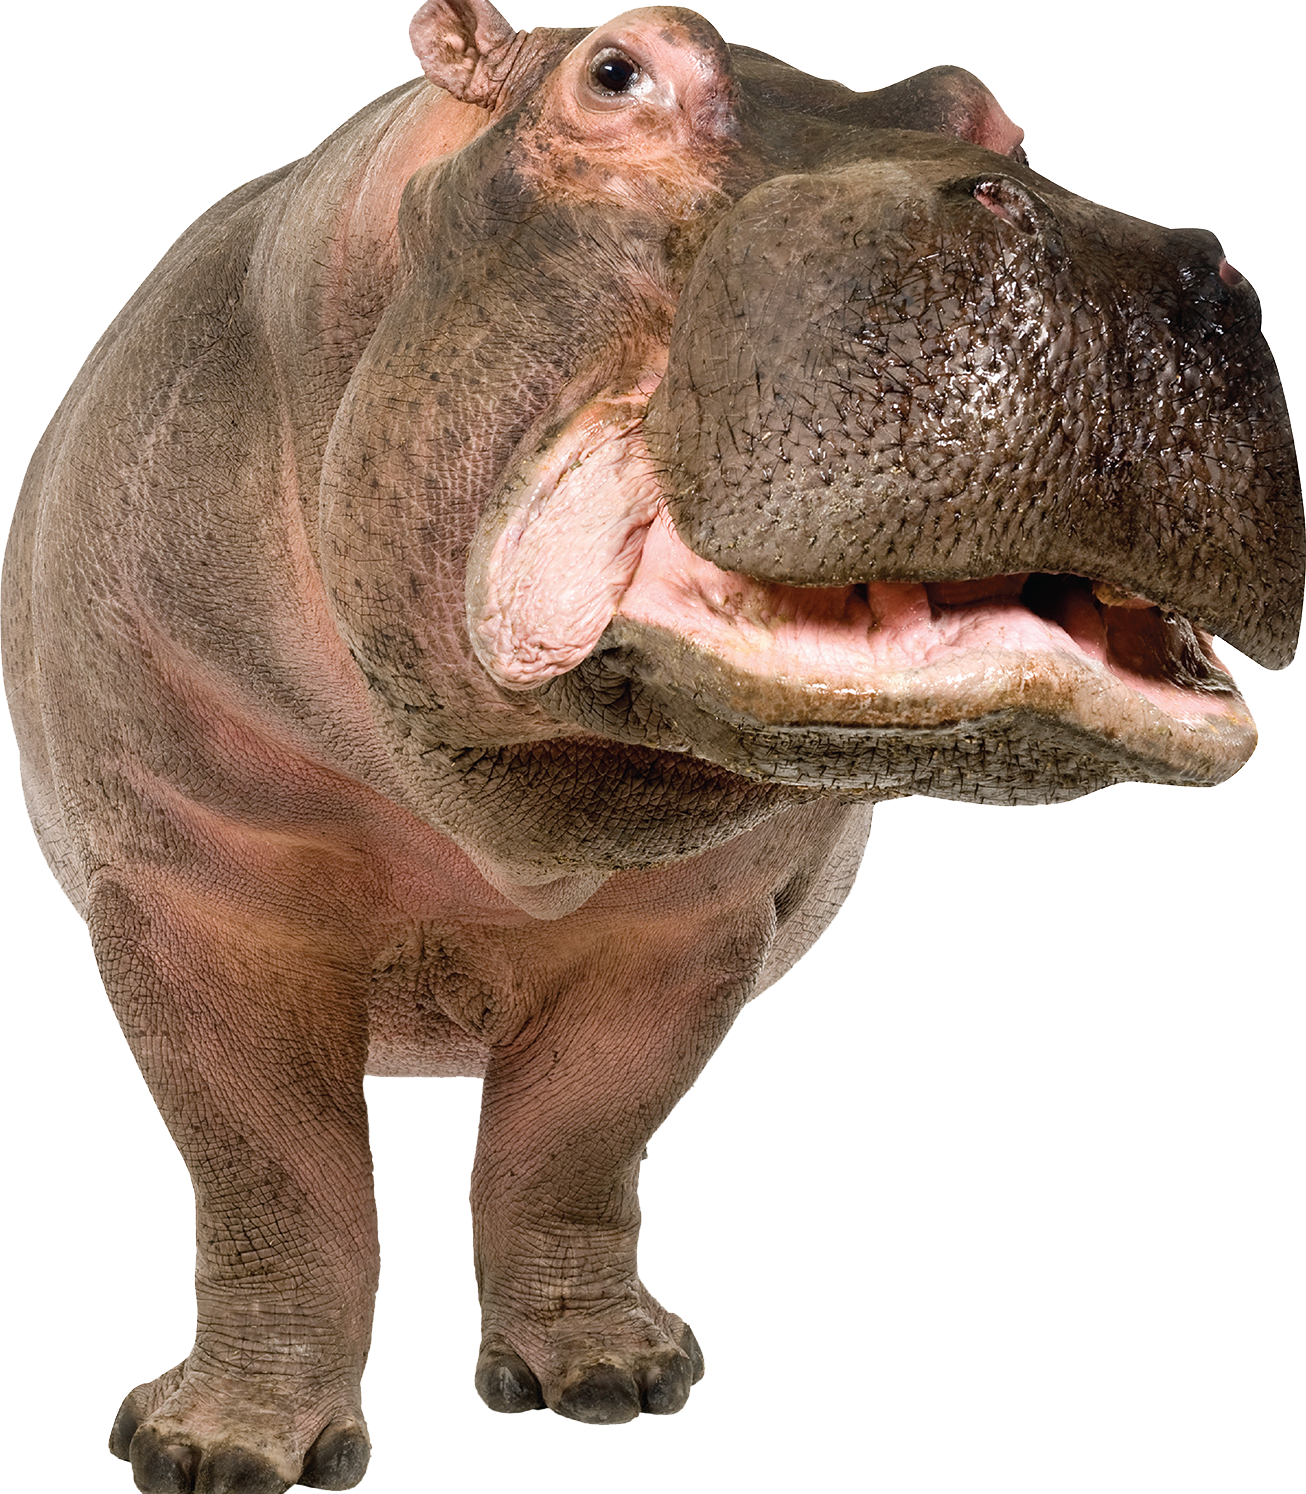 Hippo clipart real. Hippopotamus png transparent images